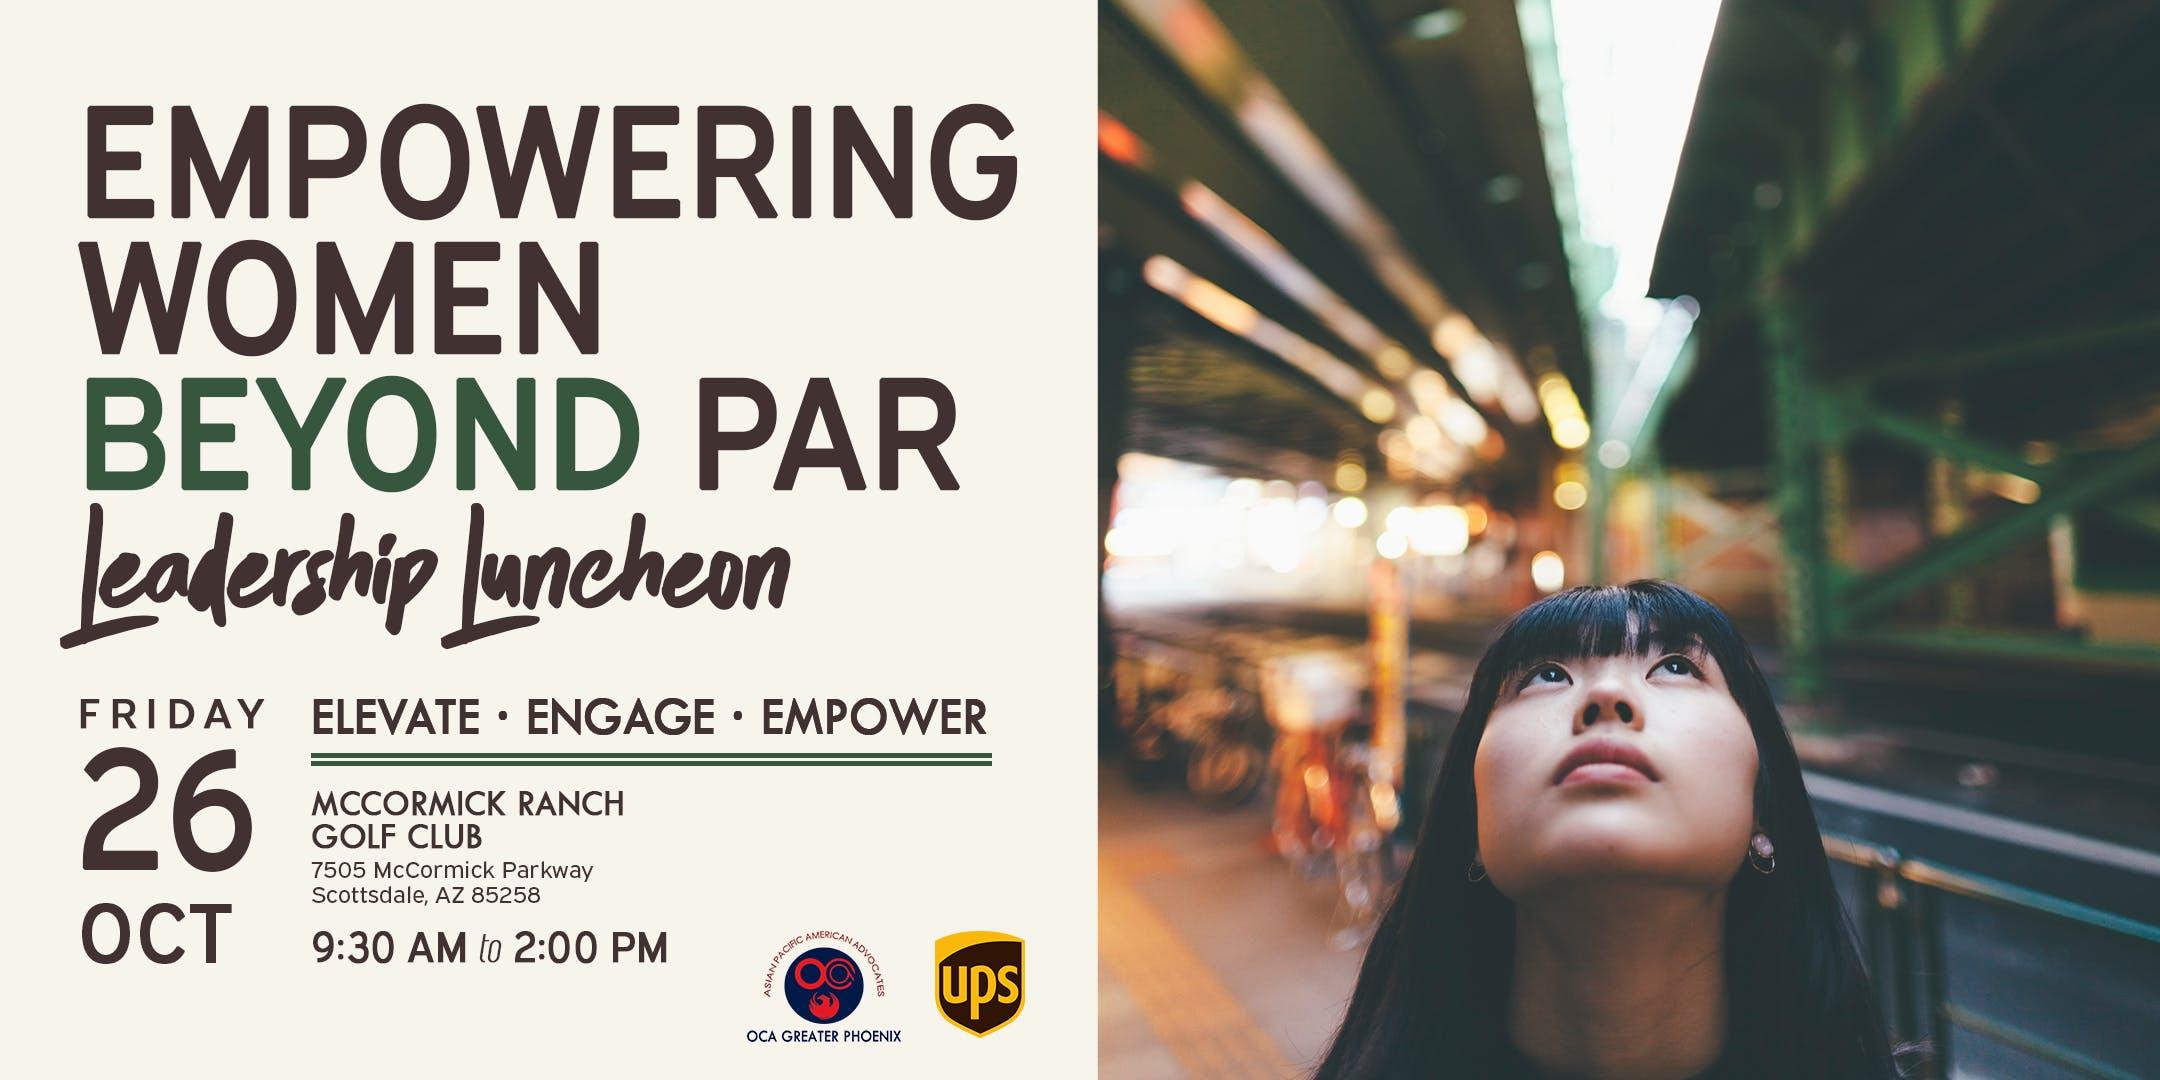 Empowering Women Beyond Par - Leadership Luncheon